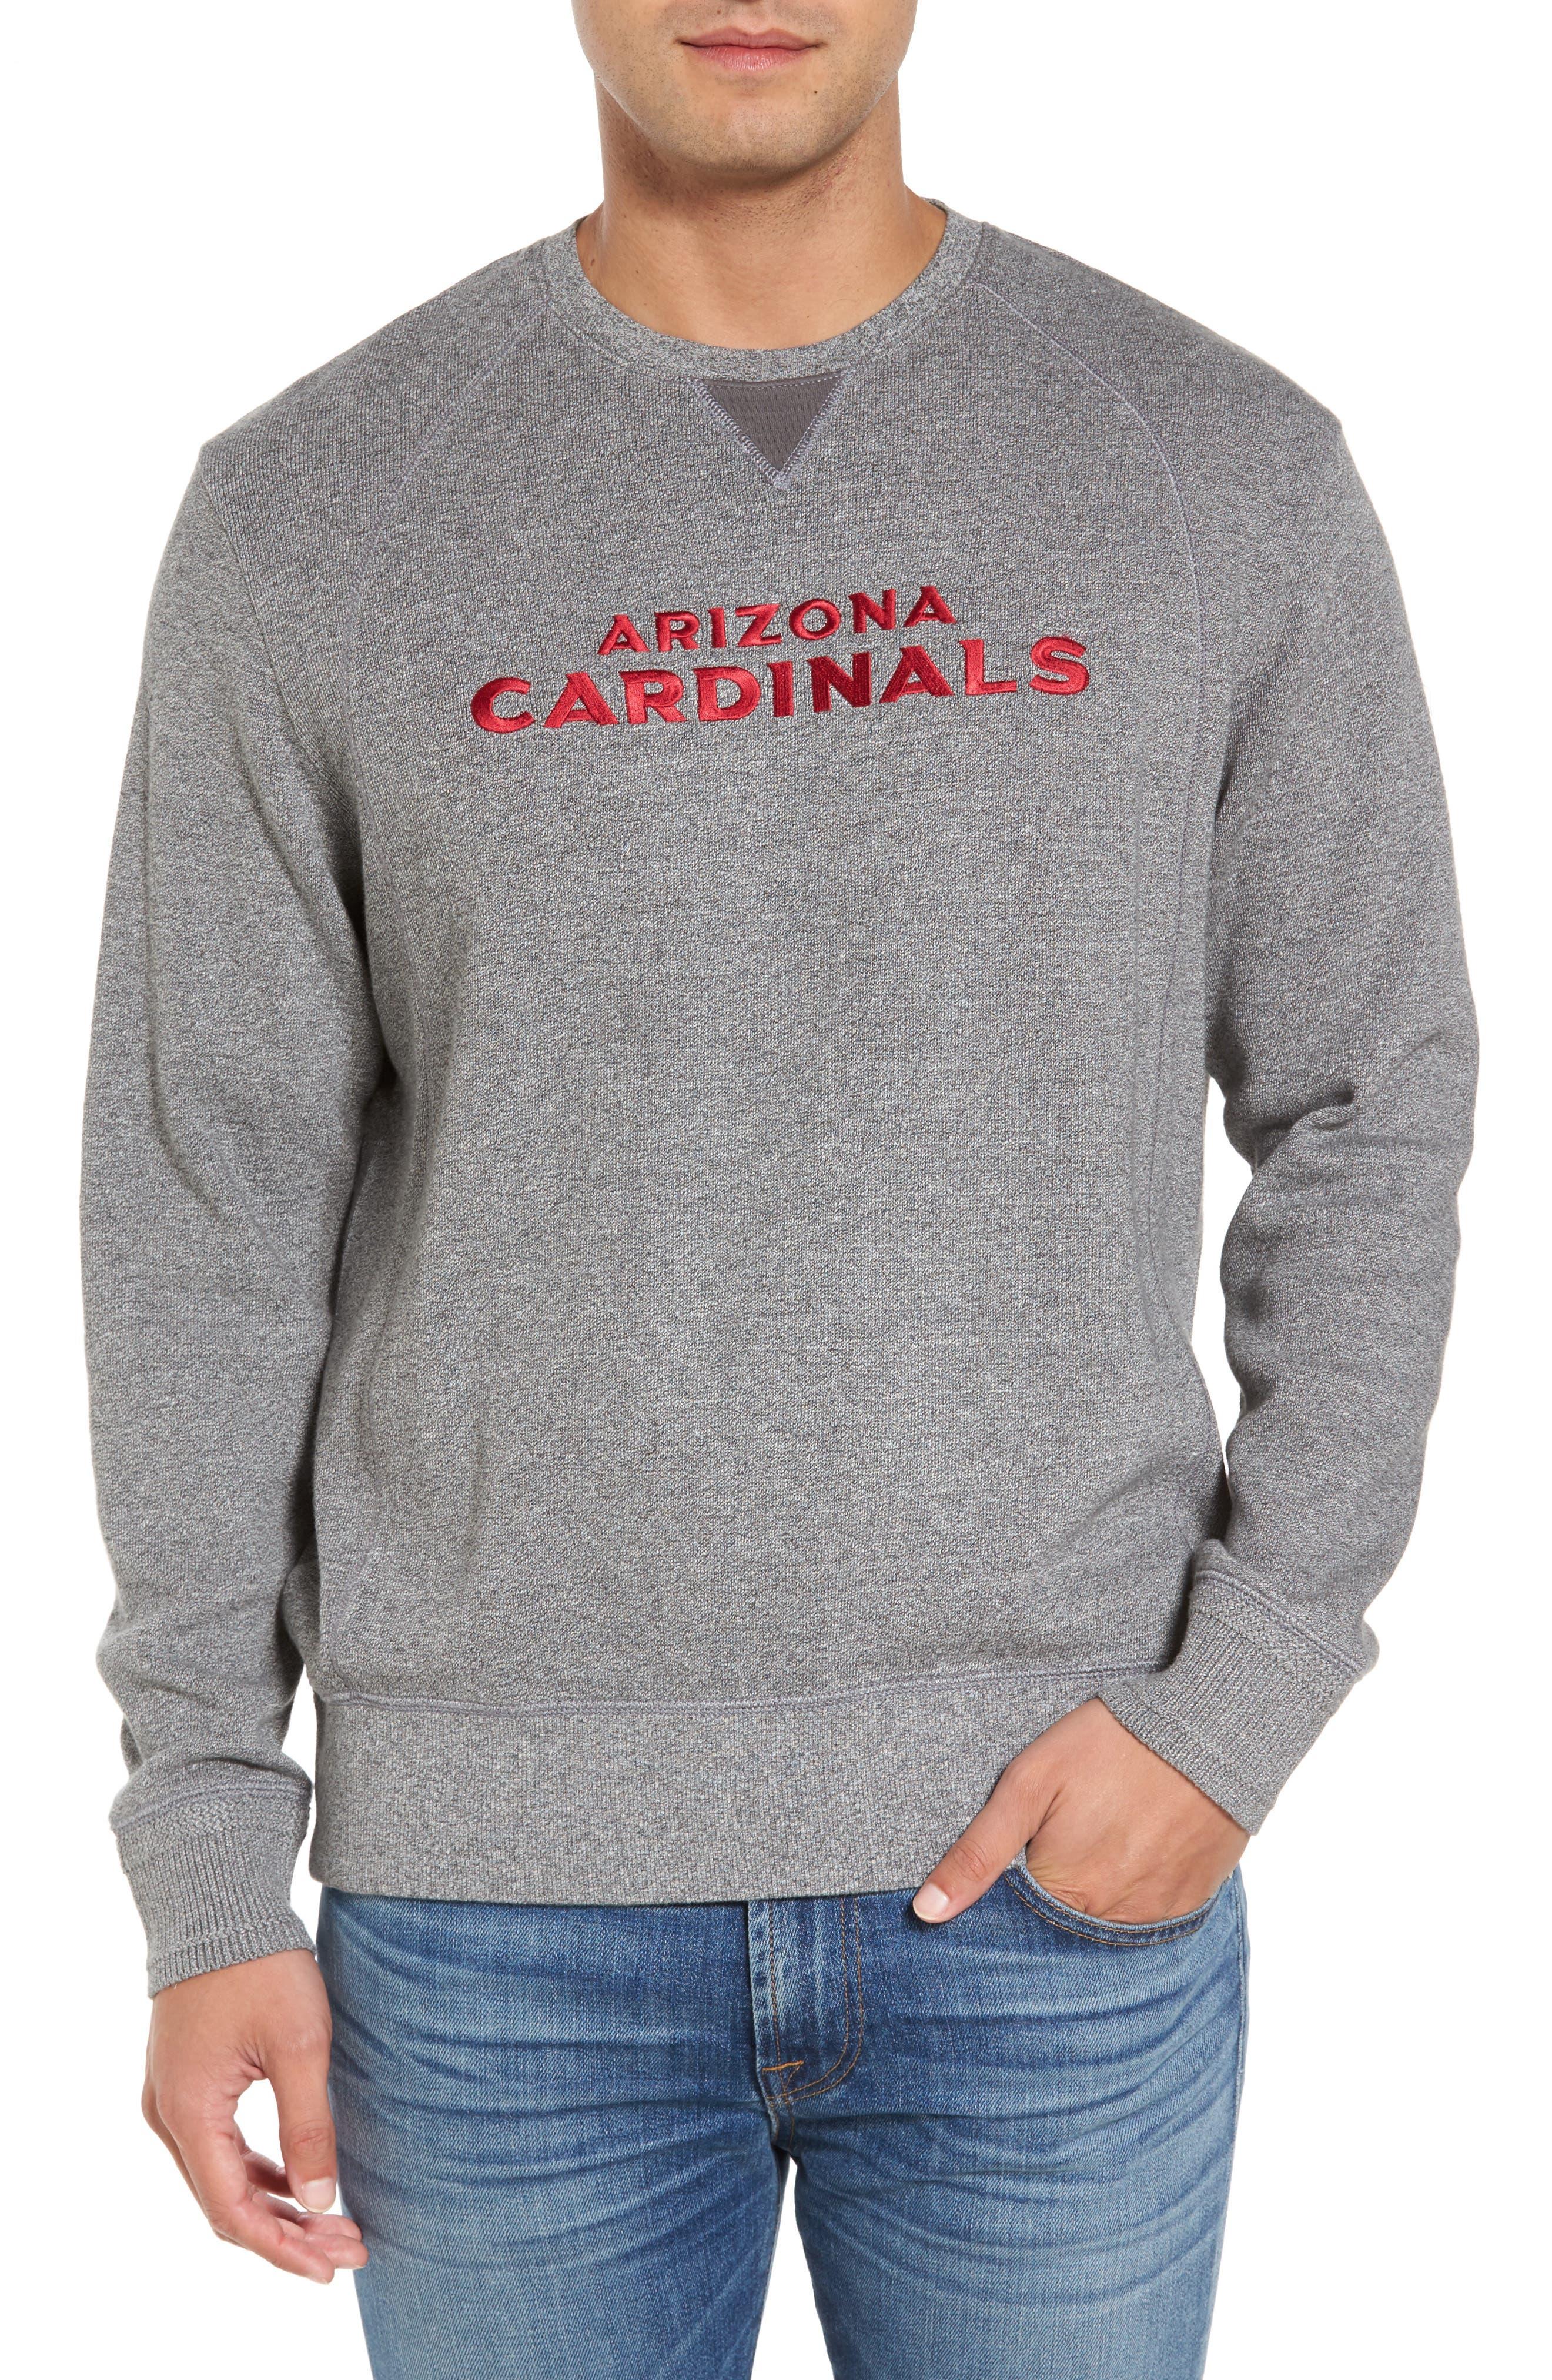 NFL Stitch of Liberty Embroidered Crewneck Sweatshirt,                             Main thumbnail 2, color,